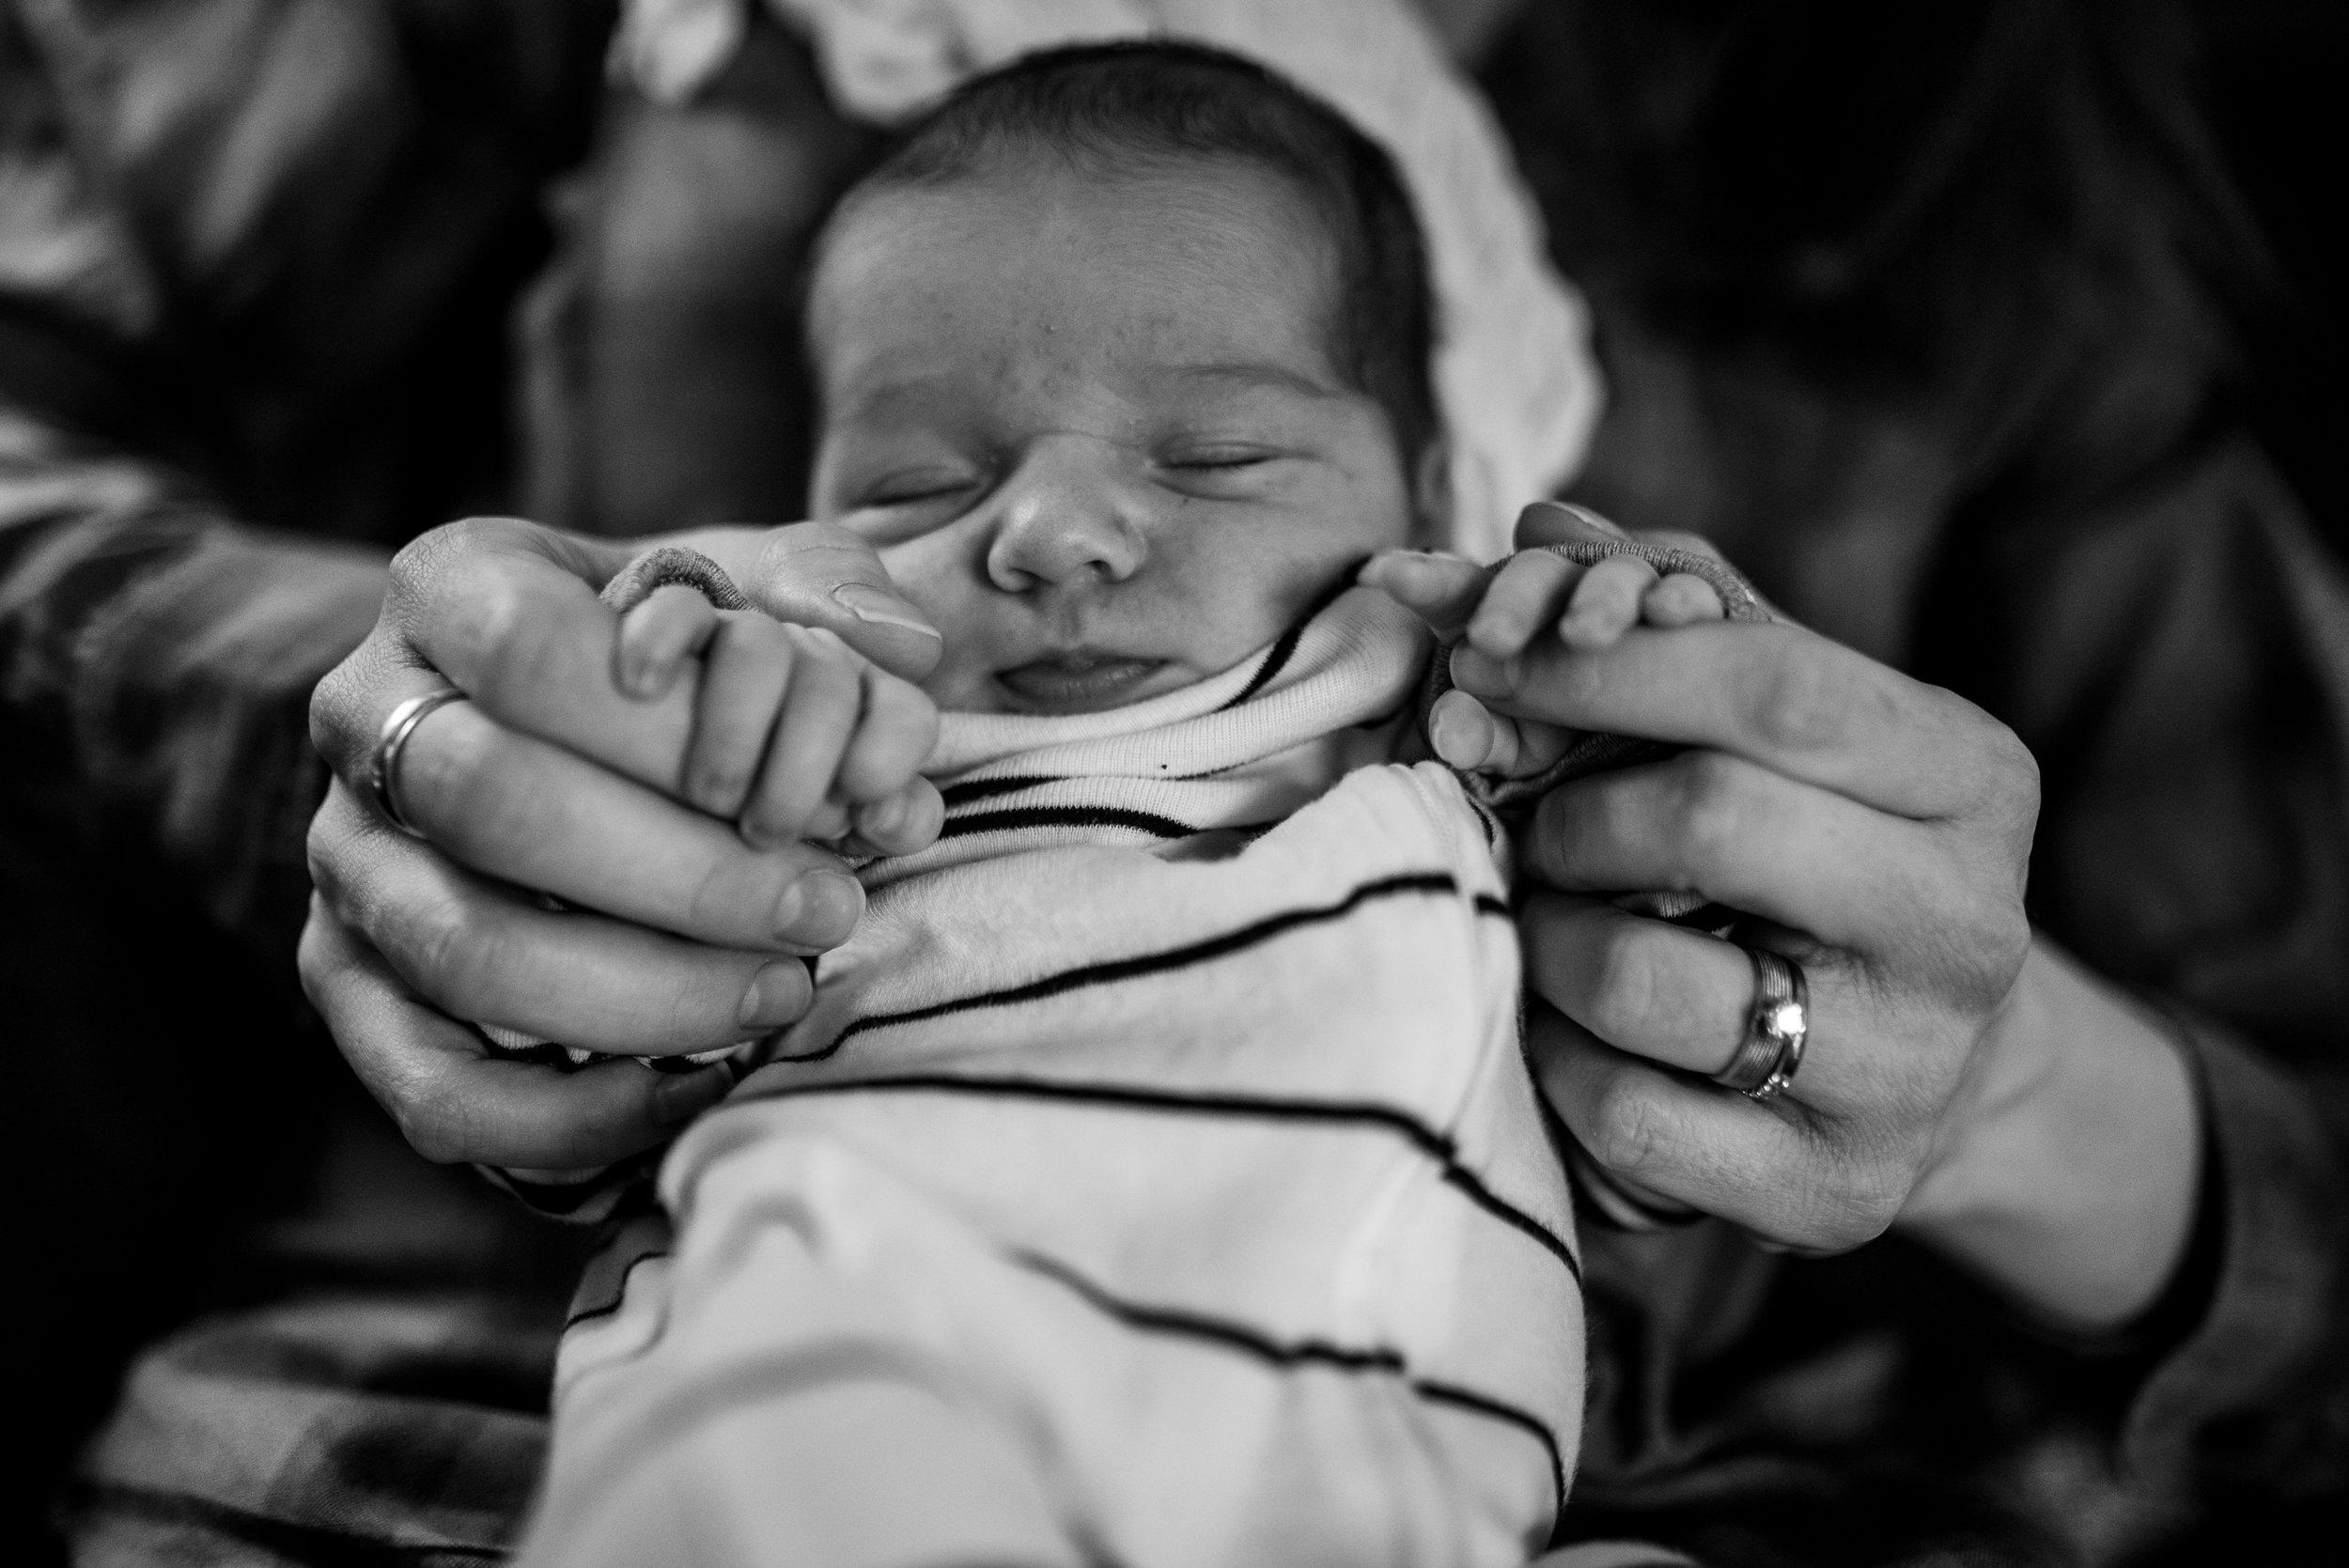 Mom holding newborn babies hands while newborn baby sleeps